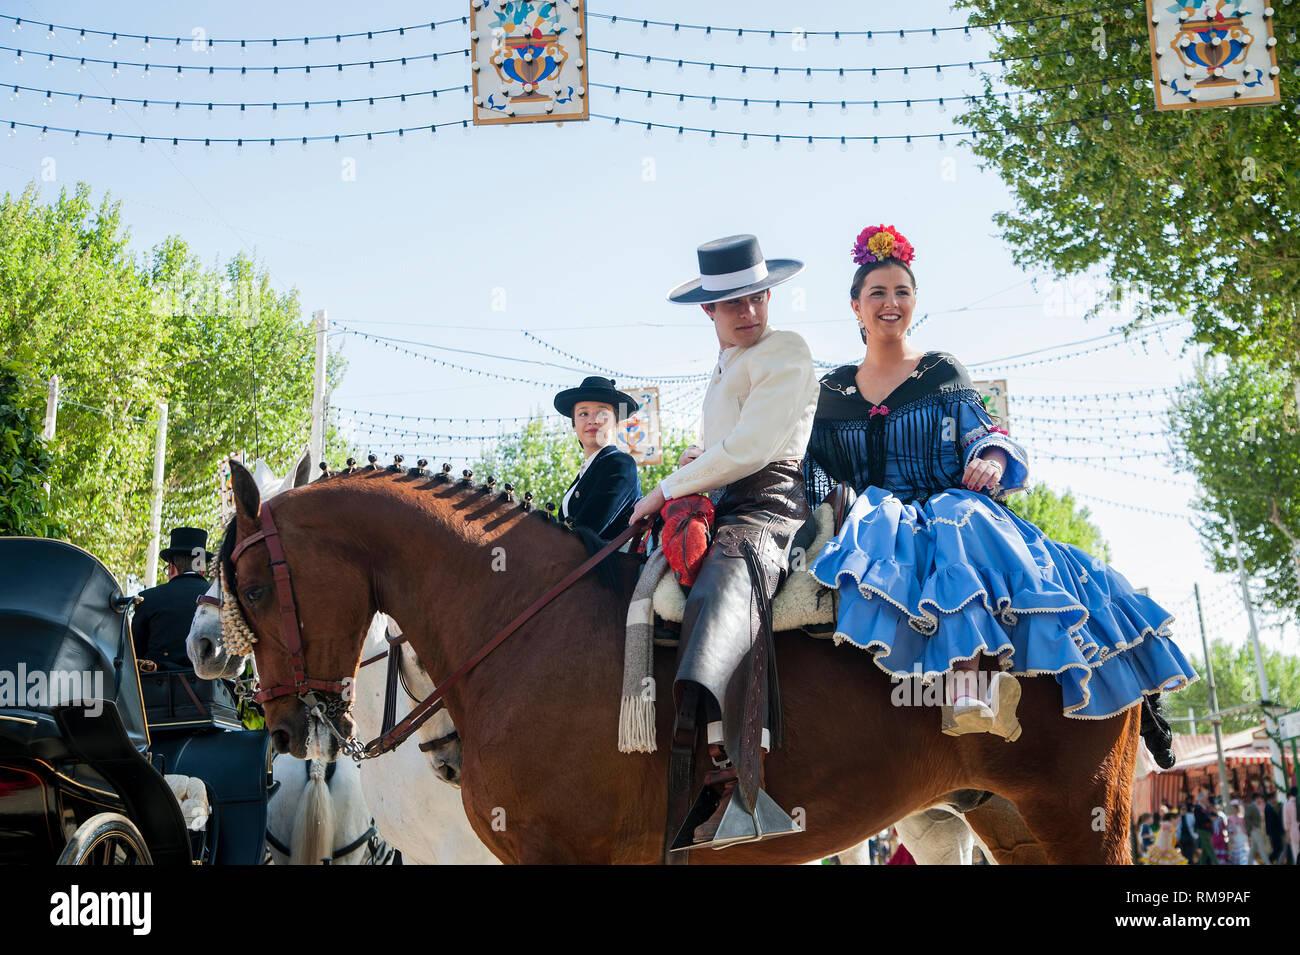 SPAIN, SEVILLE: The 'Feria de April', the April Fair, is Seville's most important festival besides the Semana Santa, the Easter week. A whole neighbou - Stock Image